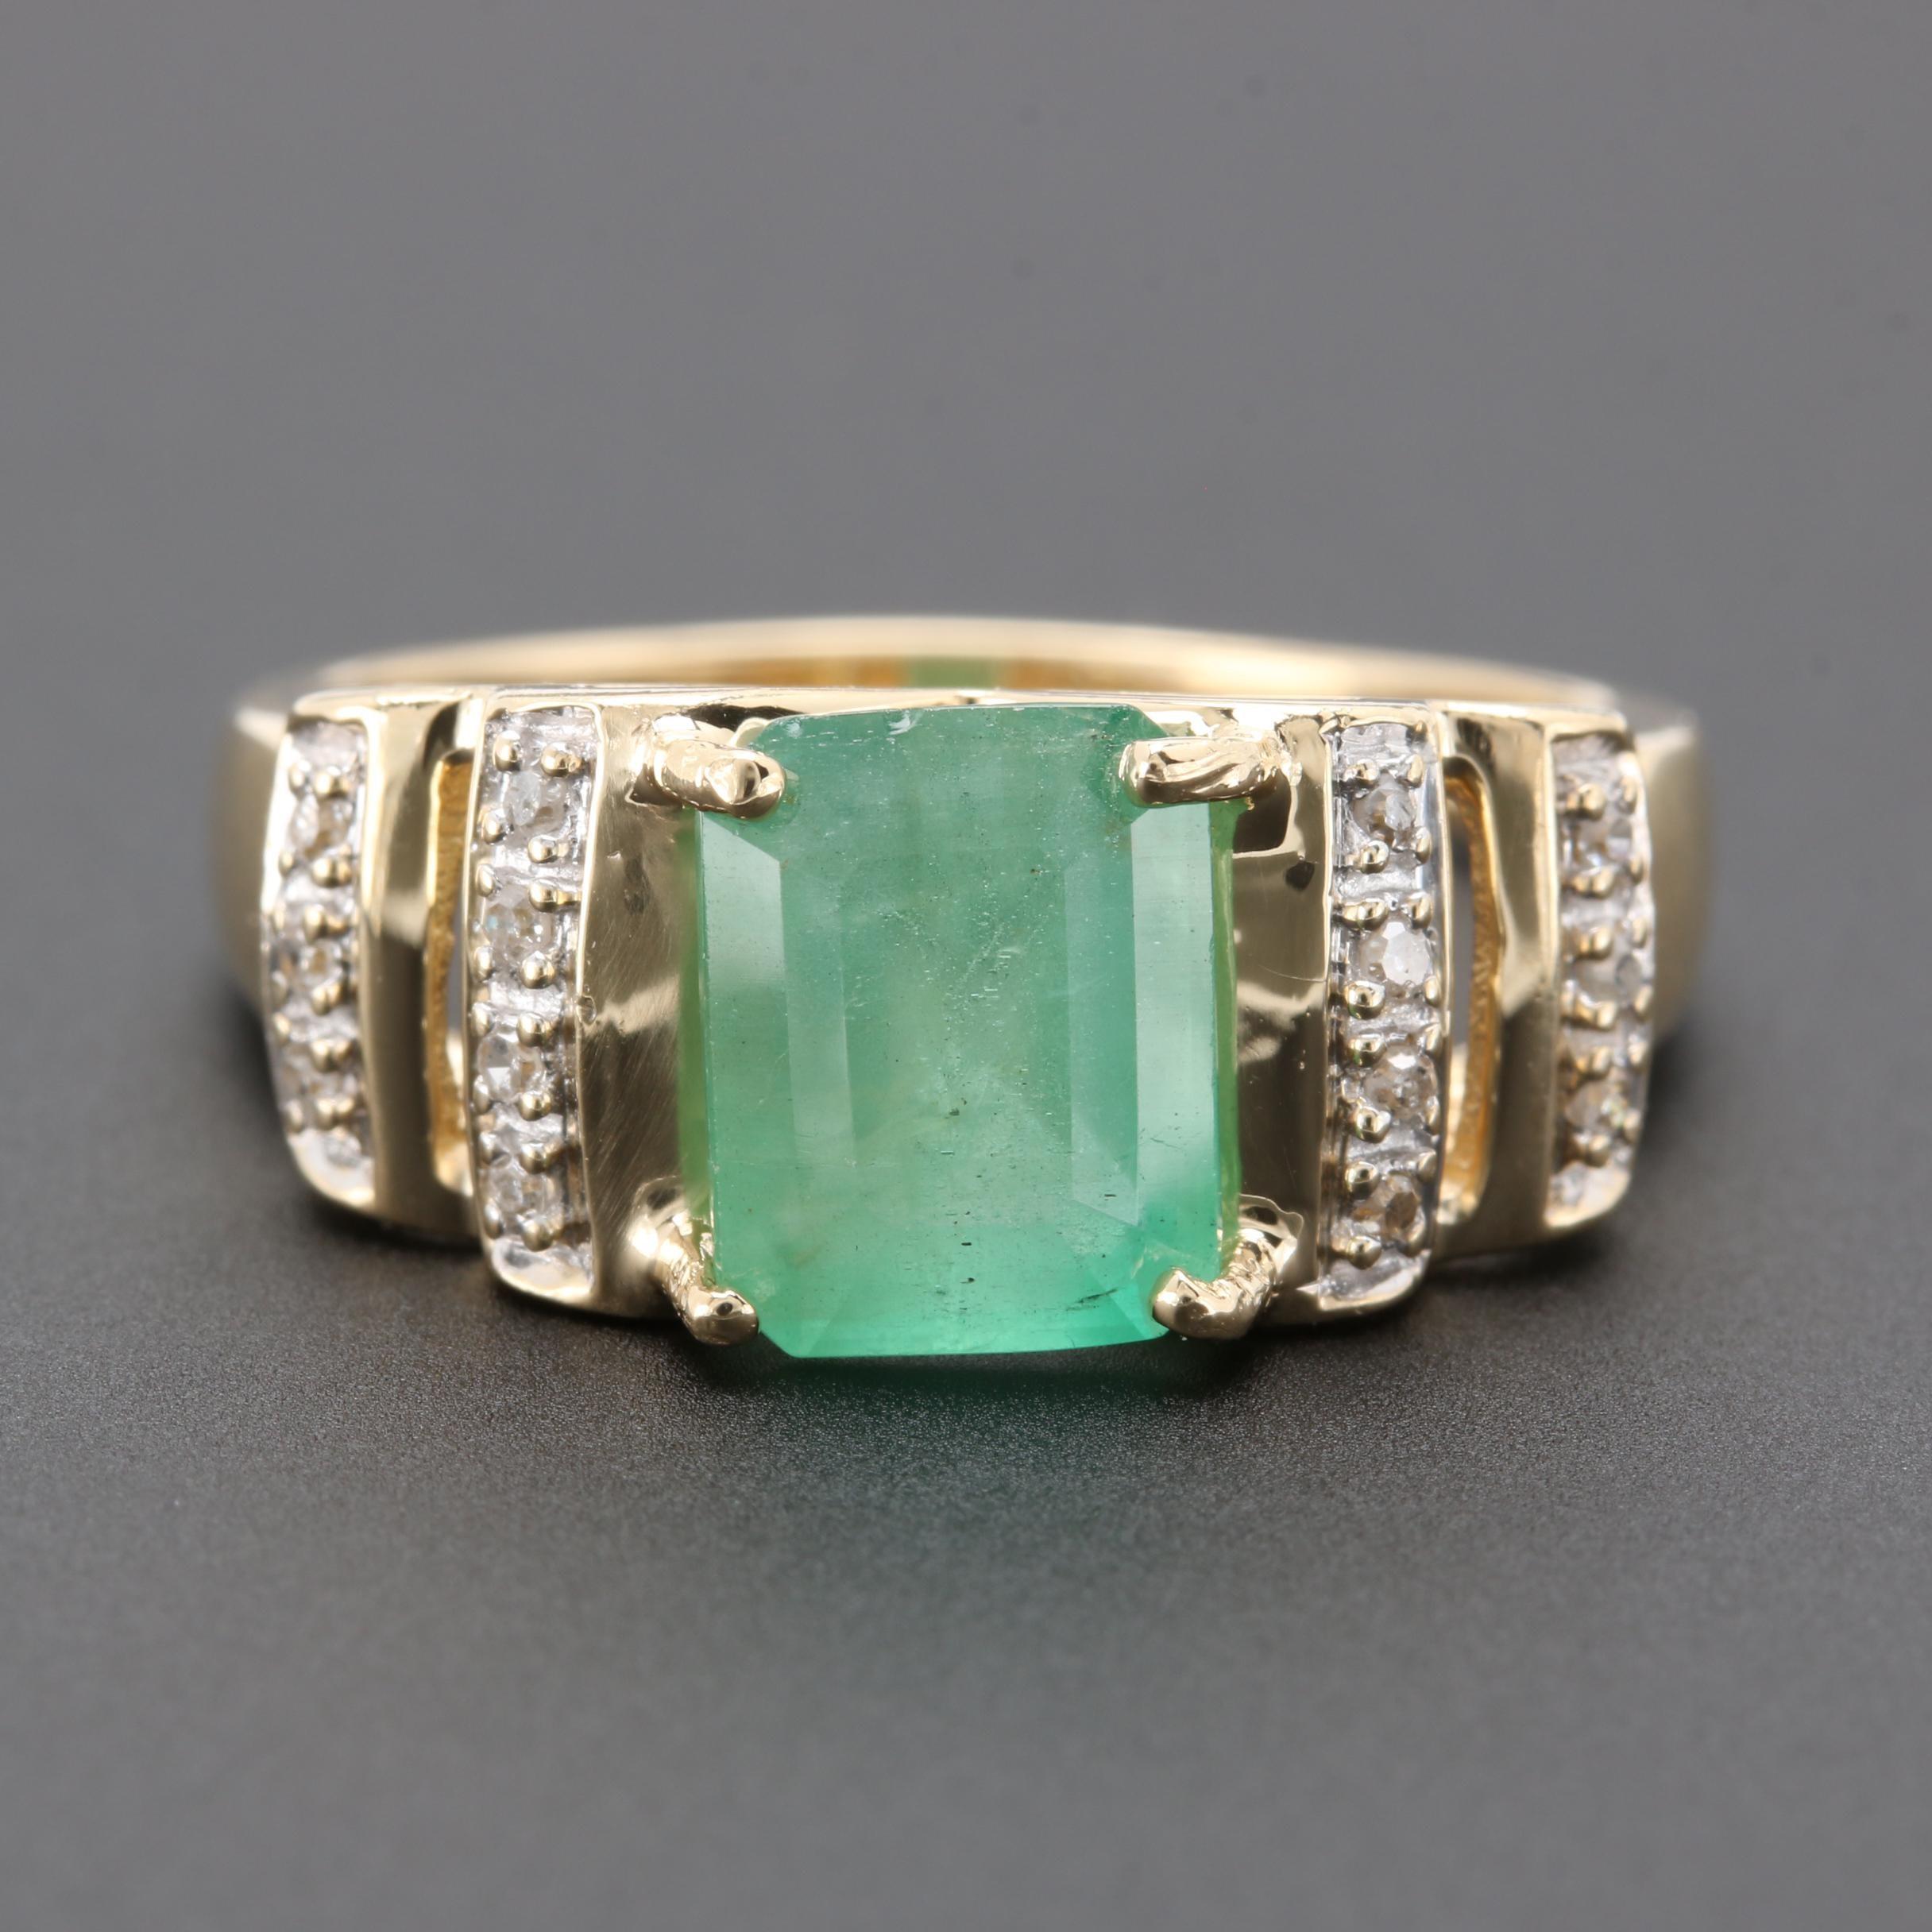 14K Yellow Gold 2.34 CT Emerald and Diamond Ring